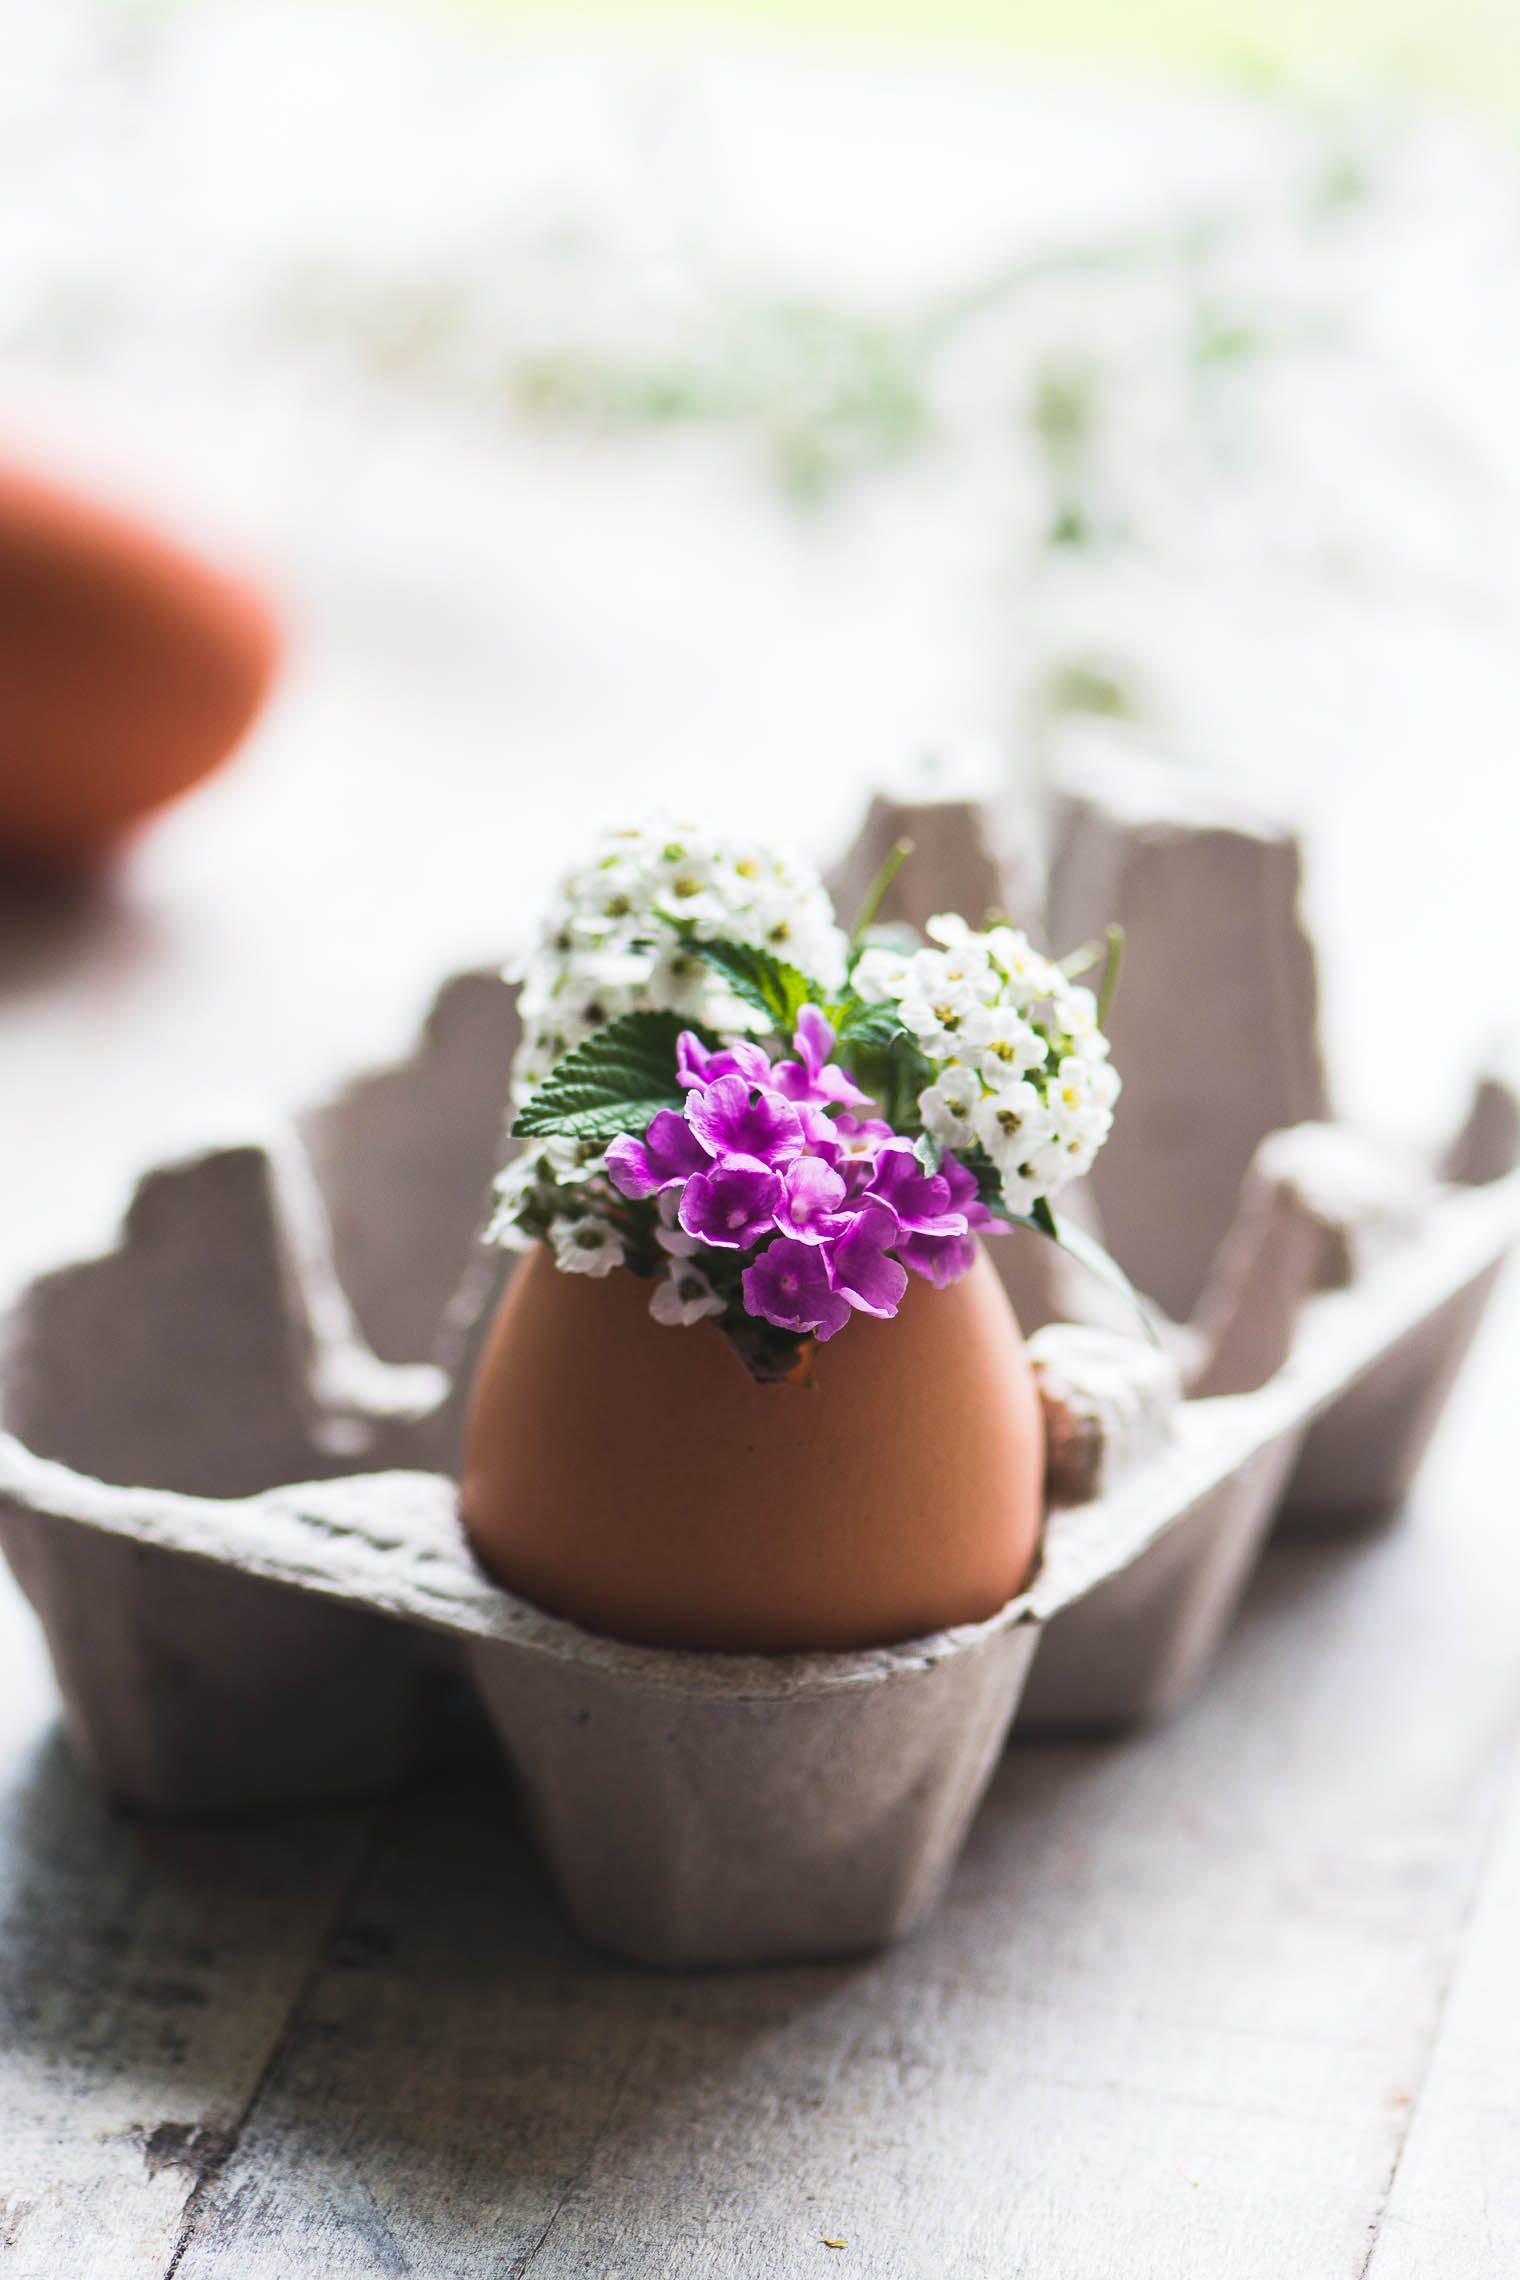 flower vase made from a half egg shell.